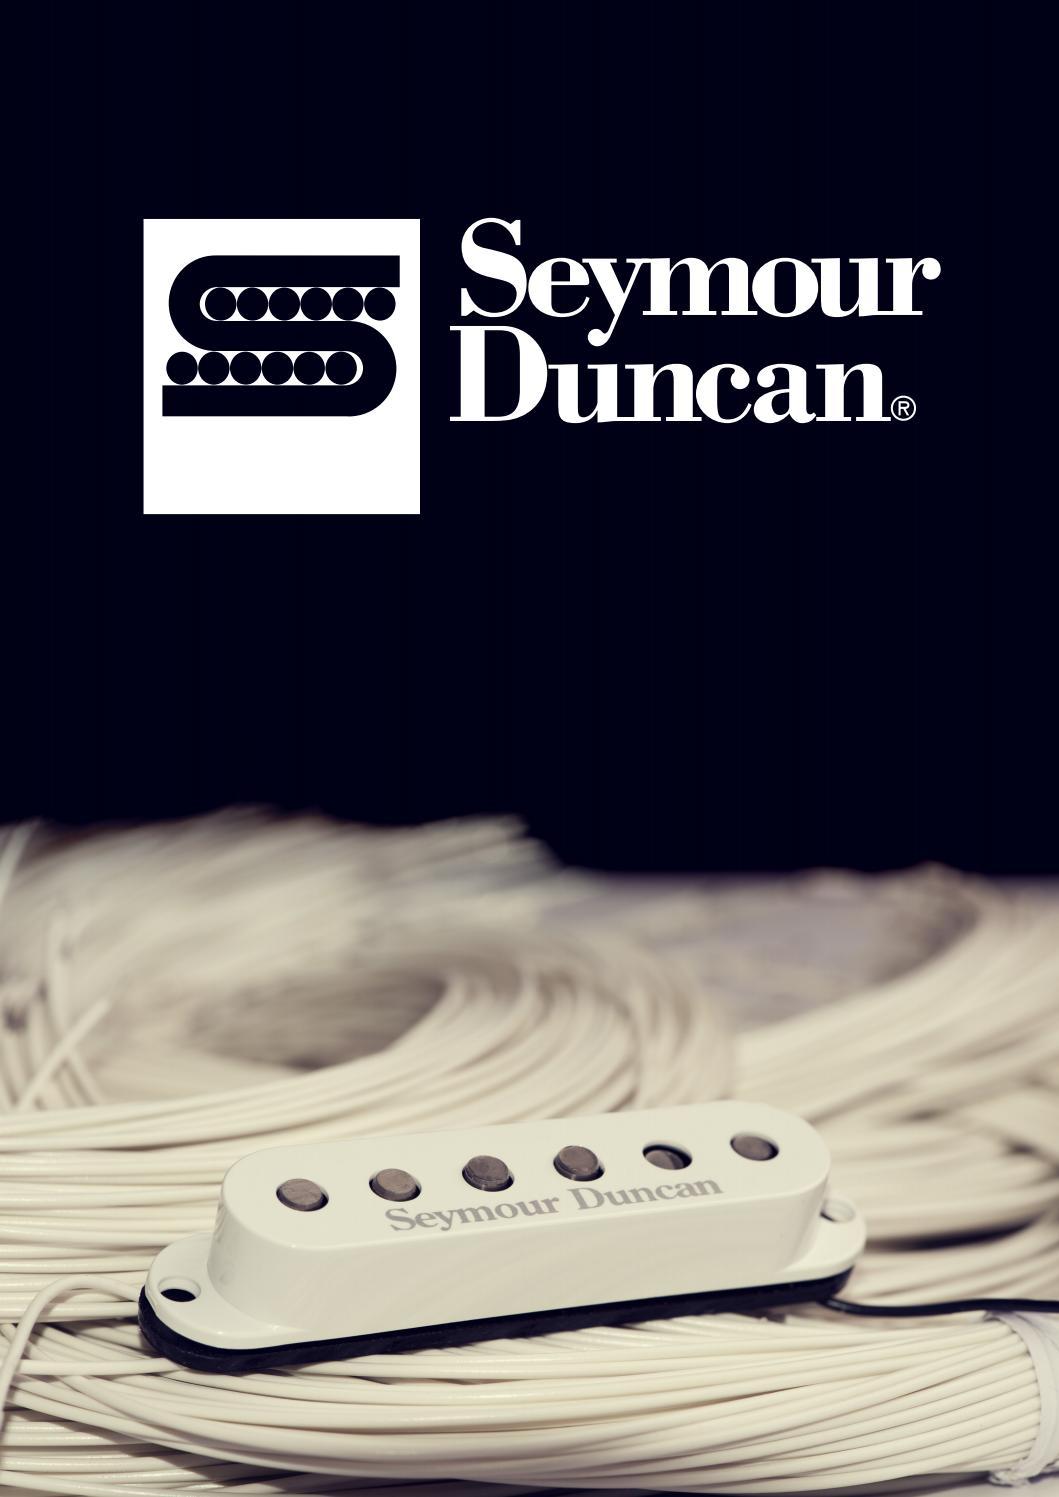 Seymour Duncan 2016 Uk Brochure By Rosetti Ltd Issuu